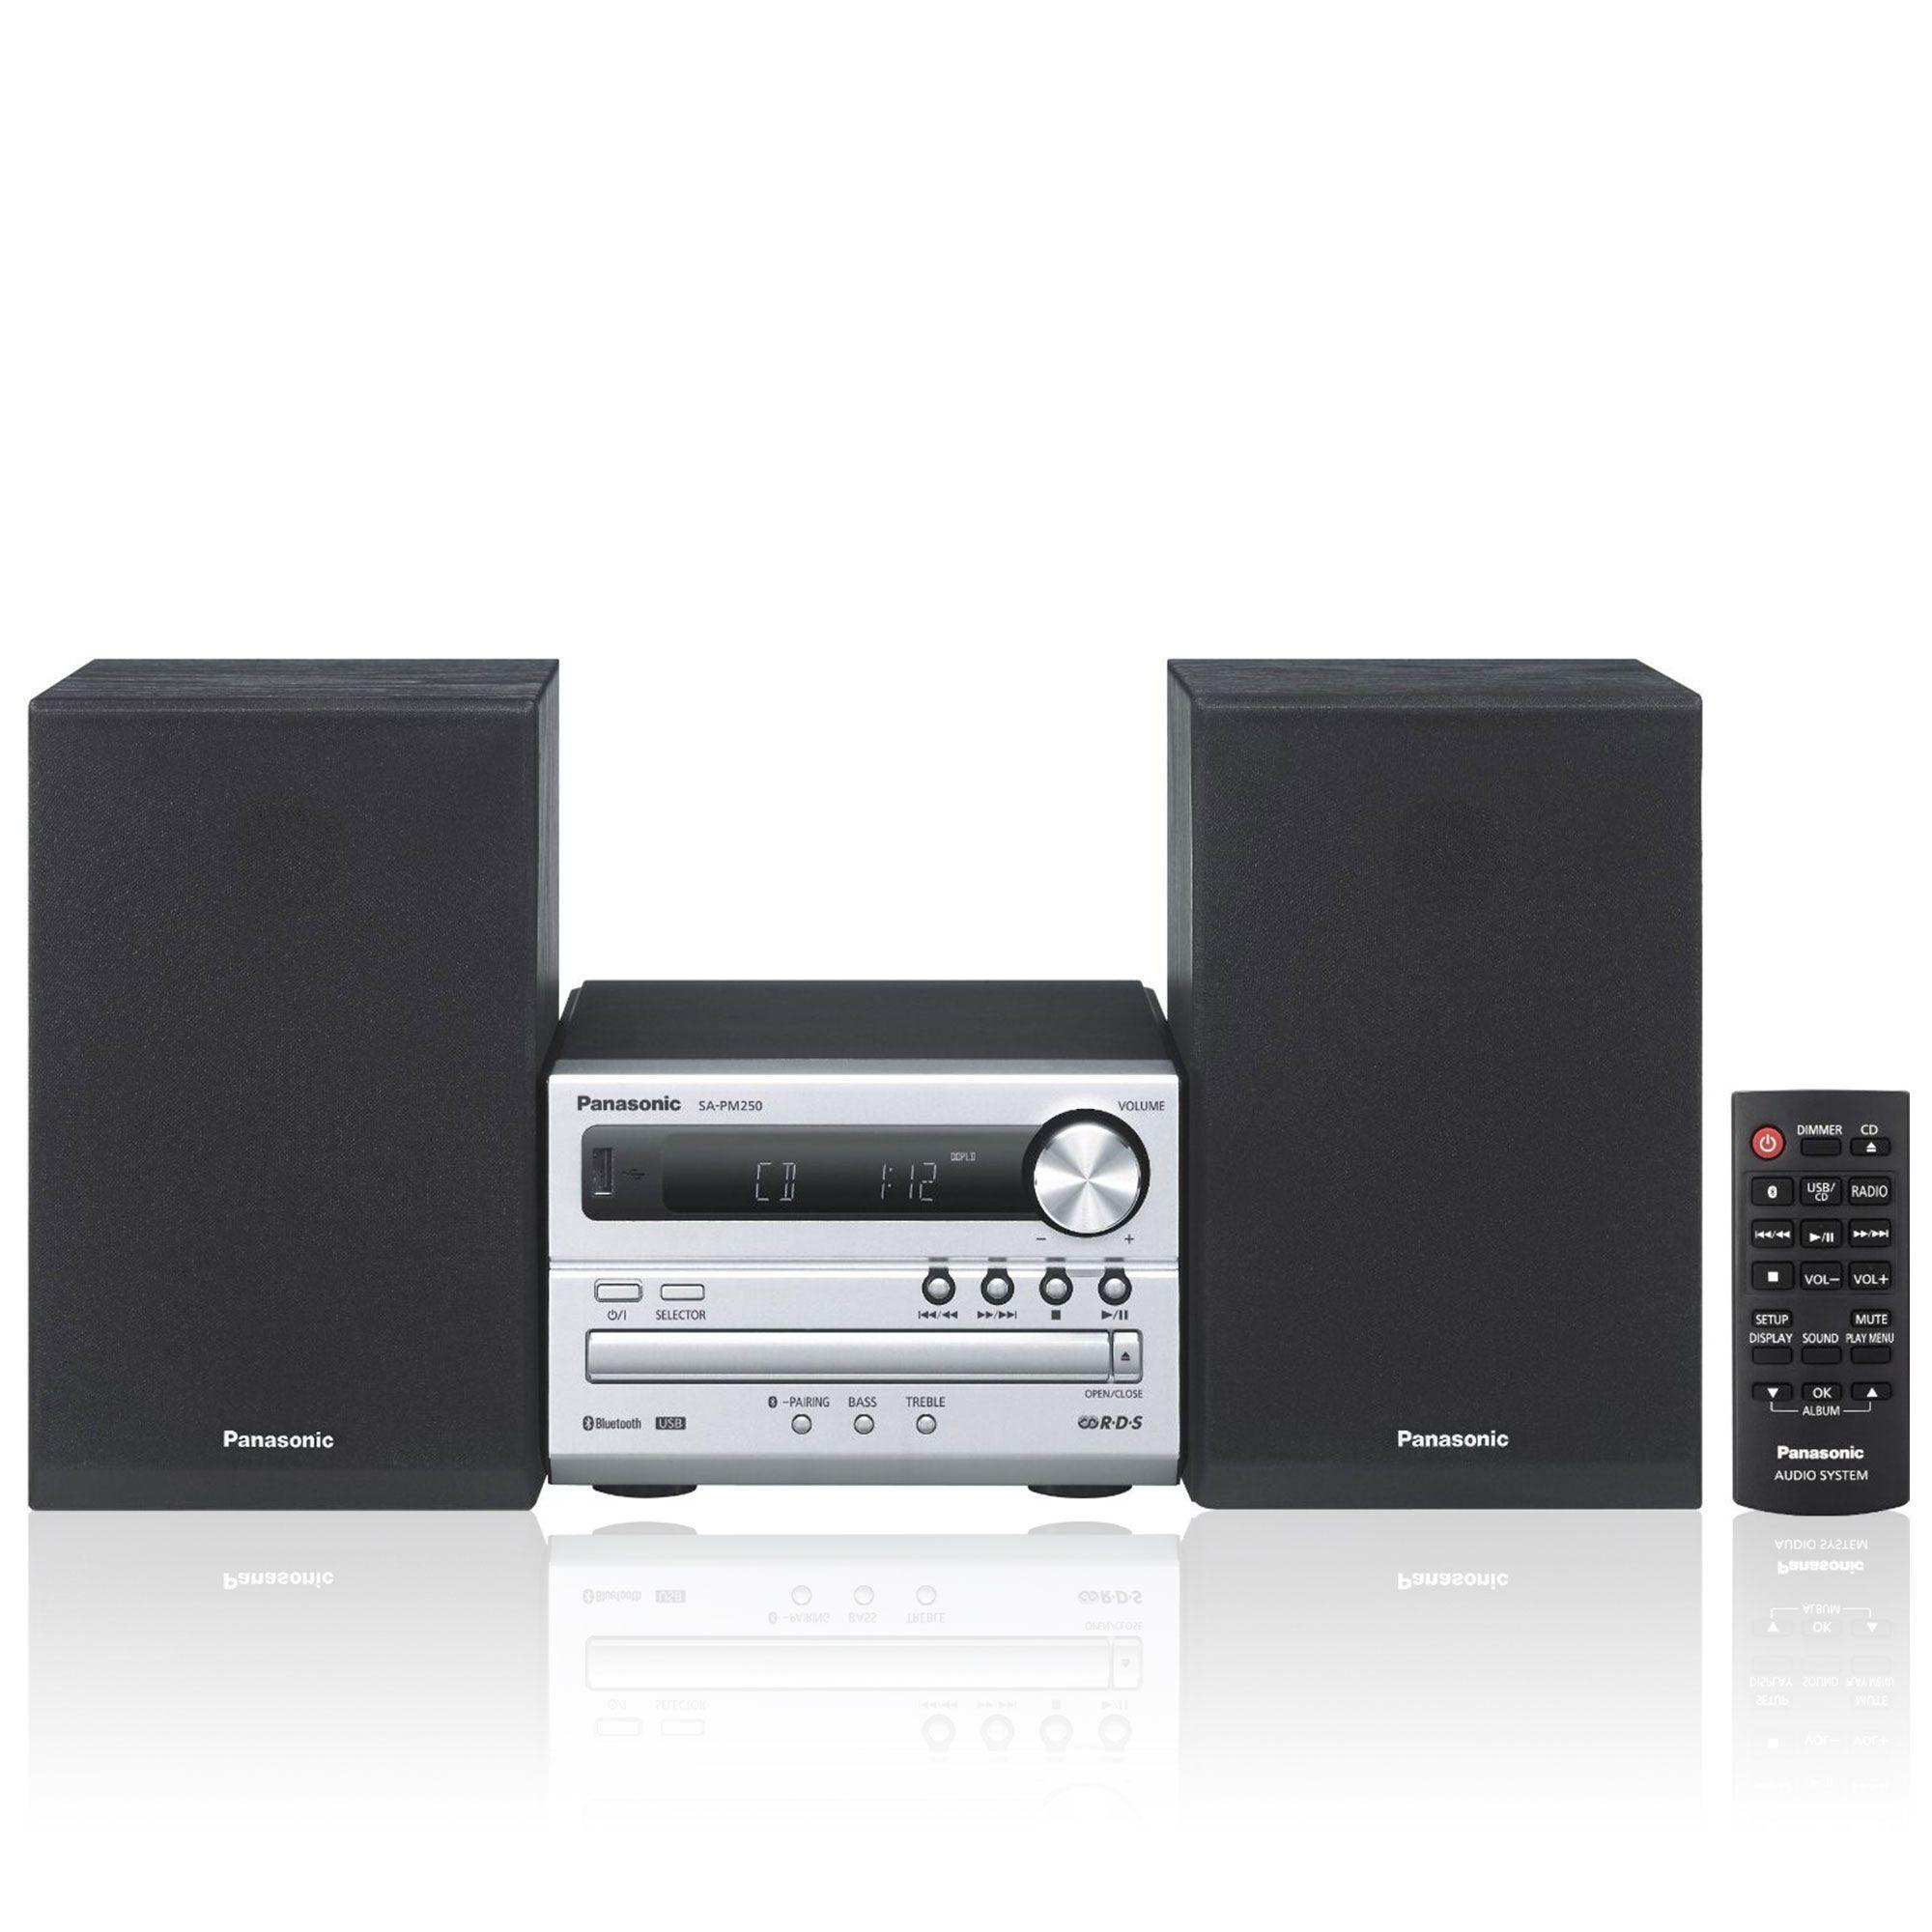 Panasonic Stereo Micro Hi-Fi SC-PM250EG-S 20W